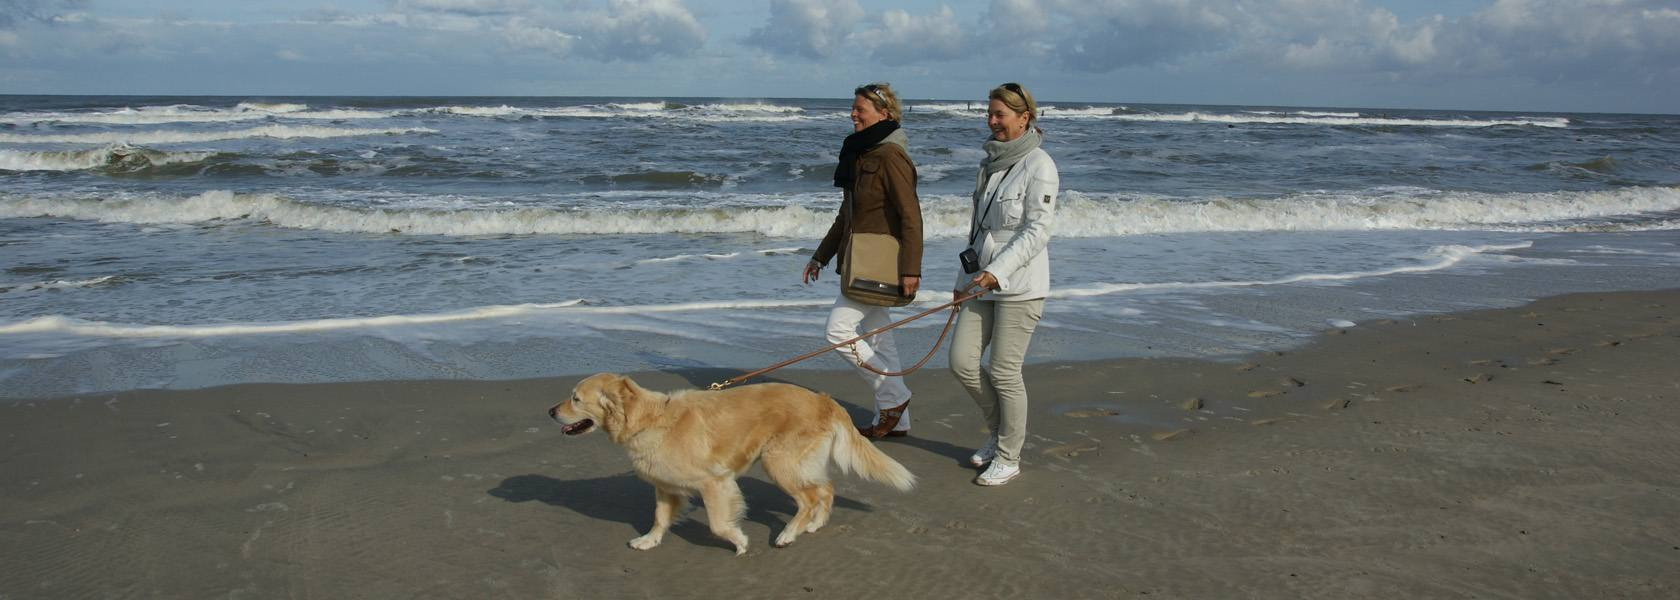 Spaziergang mit Hund, © Dirk Topel